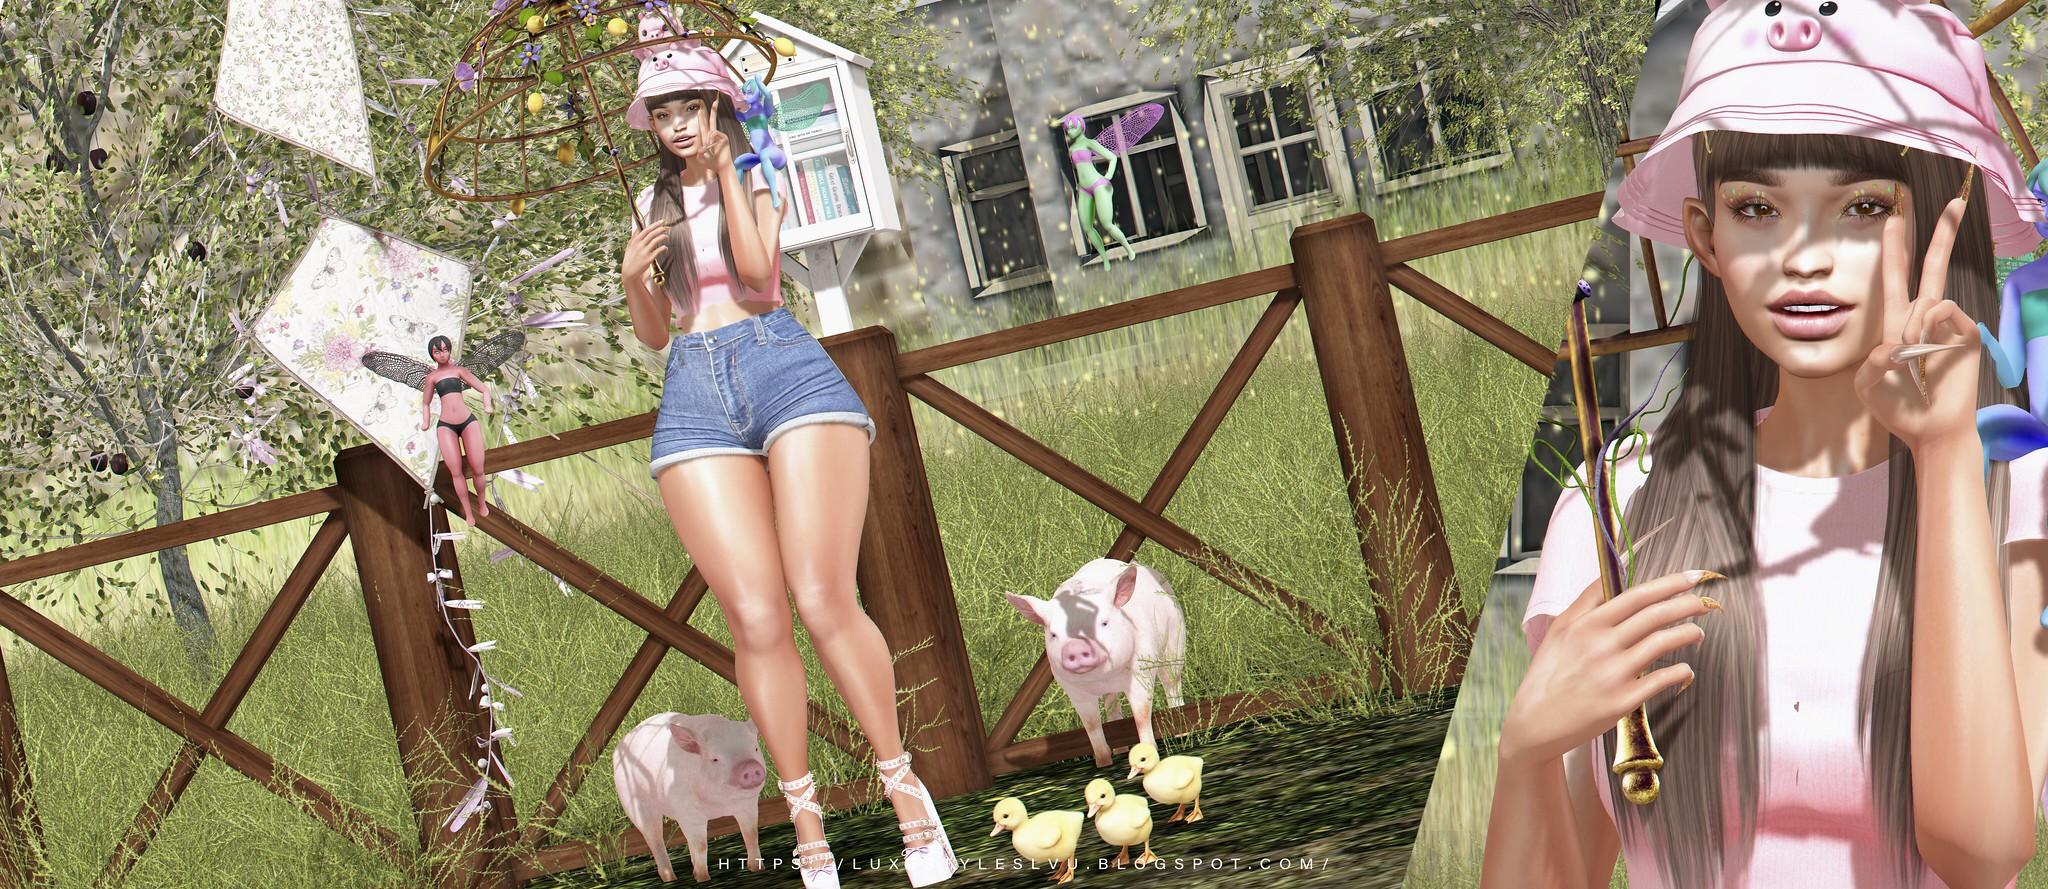 #122 Three Little Piggys 🐷🐷🐷